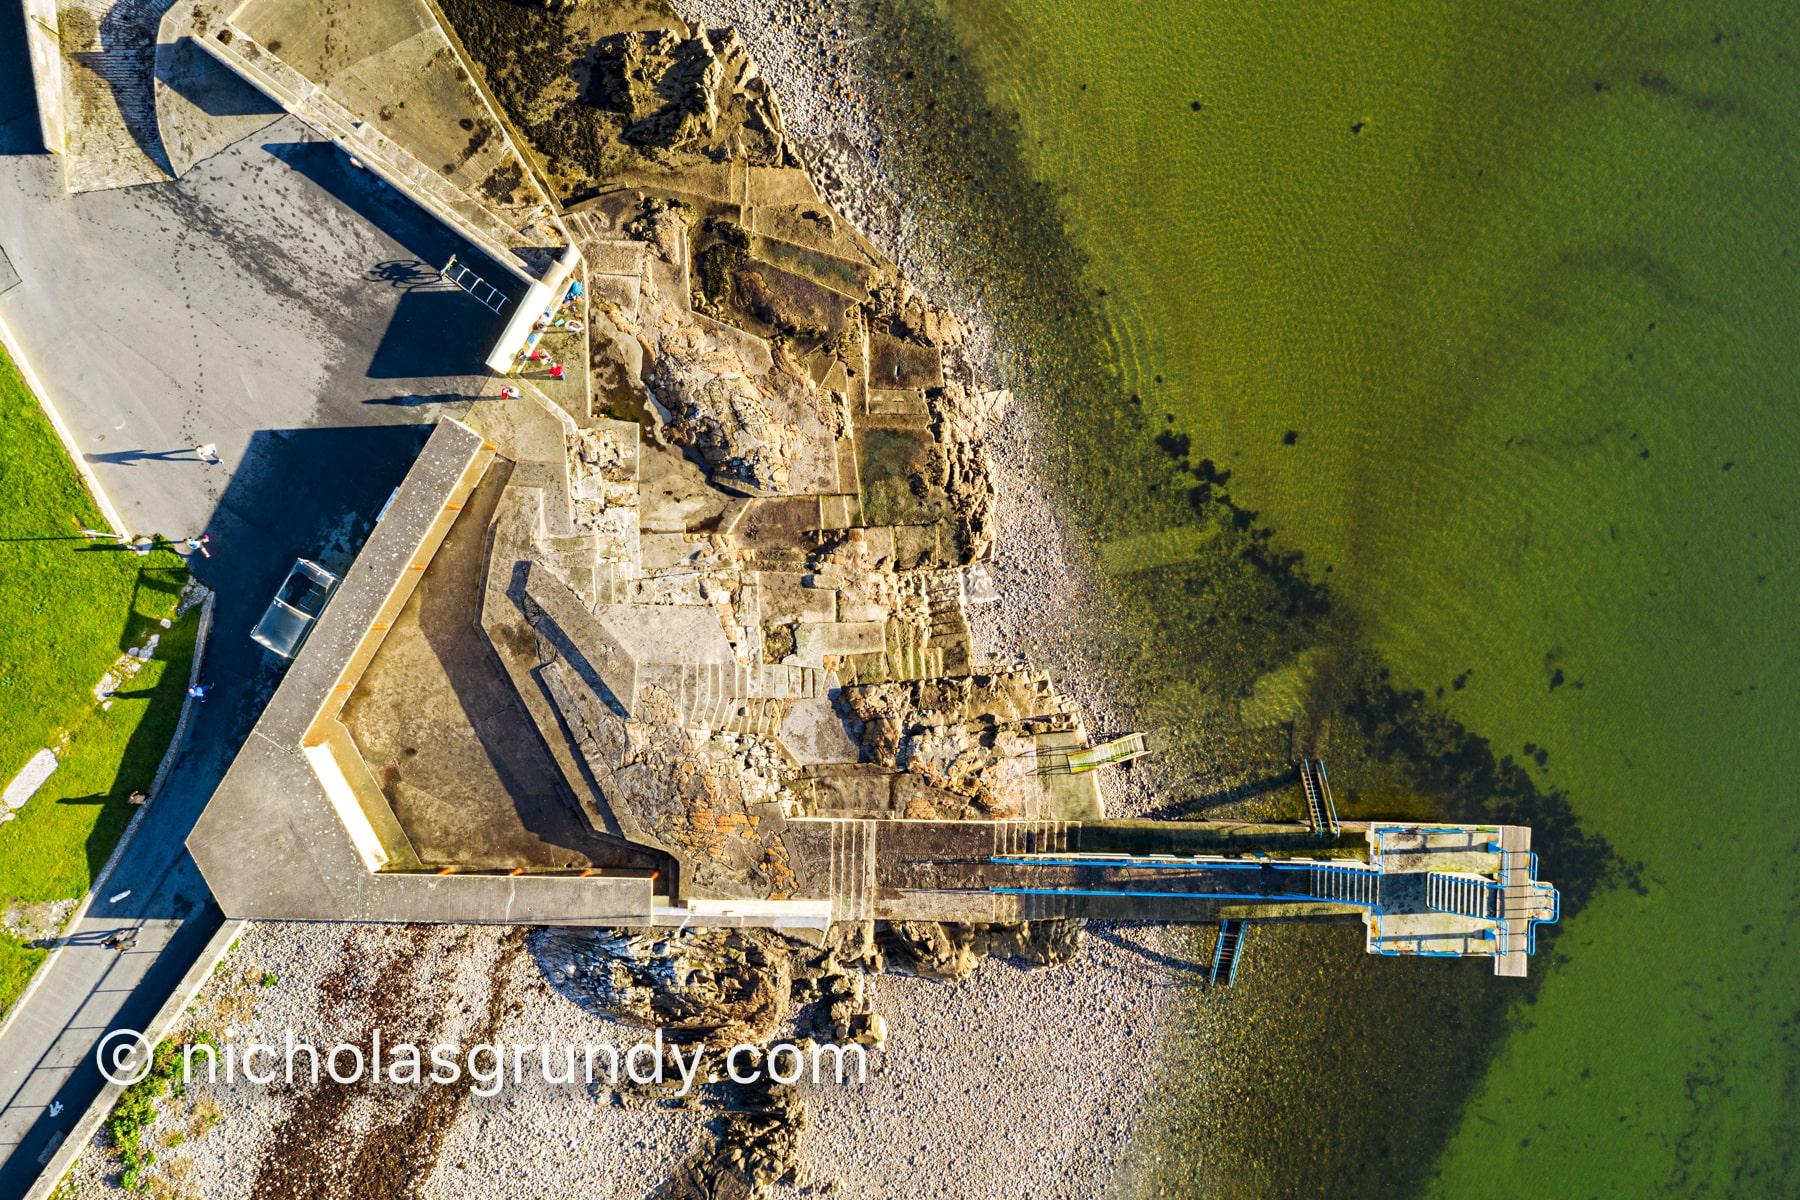 Blackdrock Diving Board Drone Photo